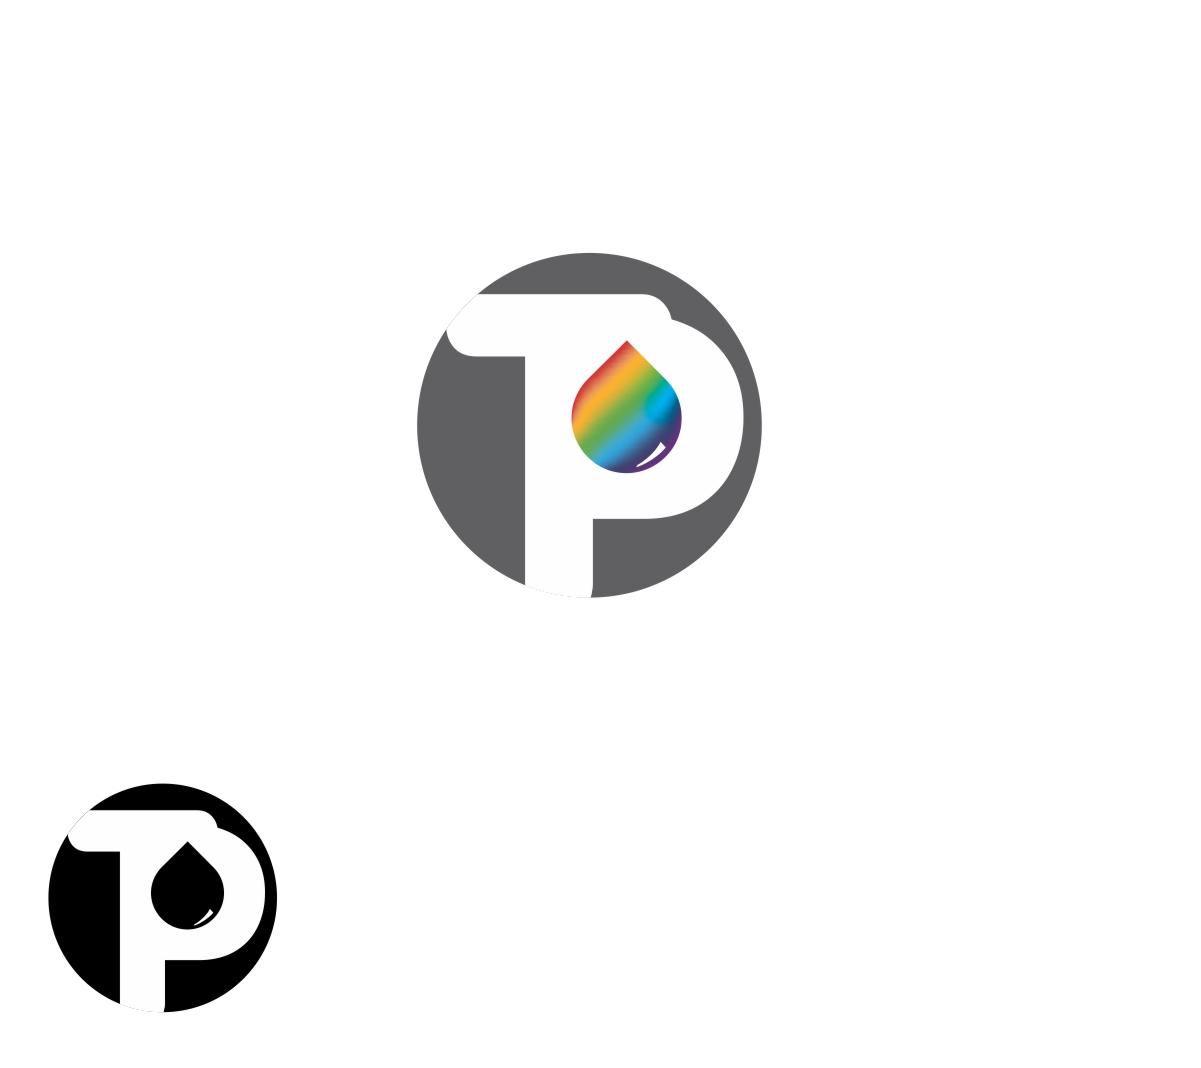 Logo Design by IDESIGNSTUDIO - Entry No. 171 in the Logo Design Contest New Logo Design for Thiem Phat company.